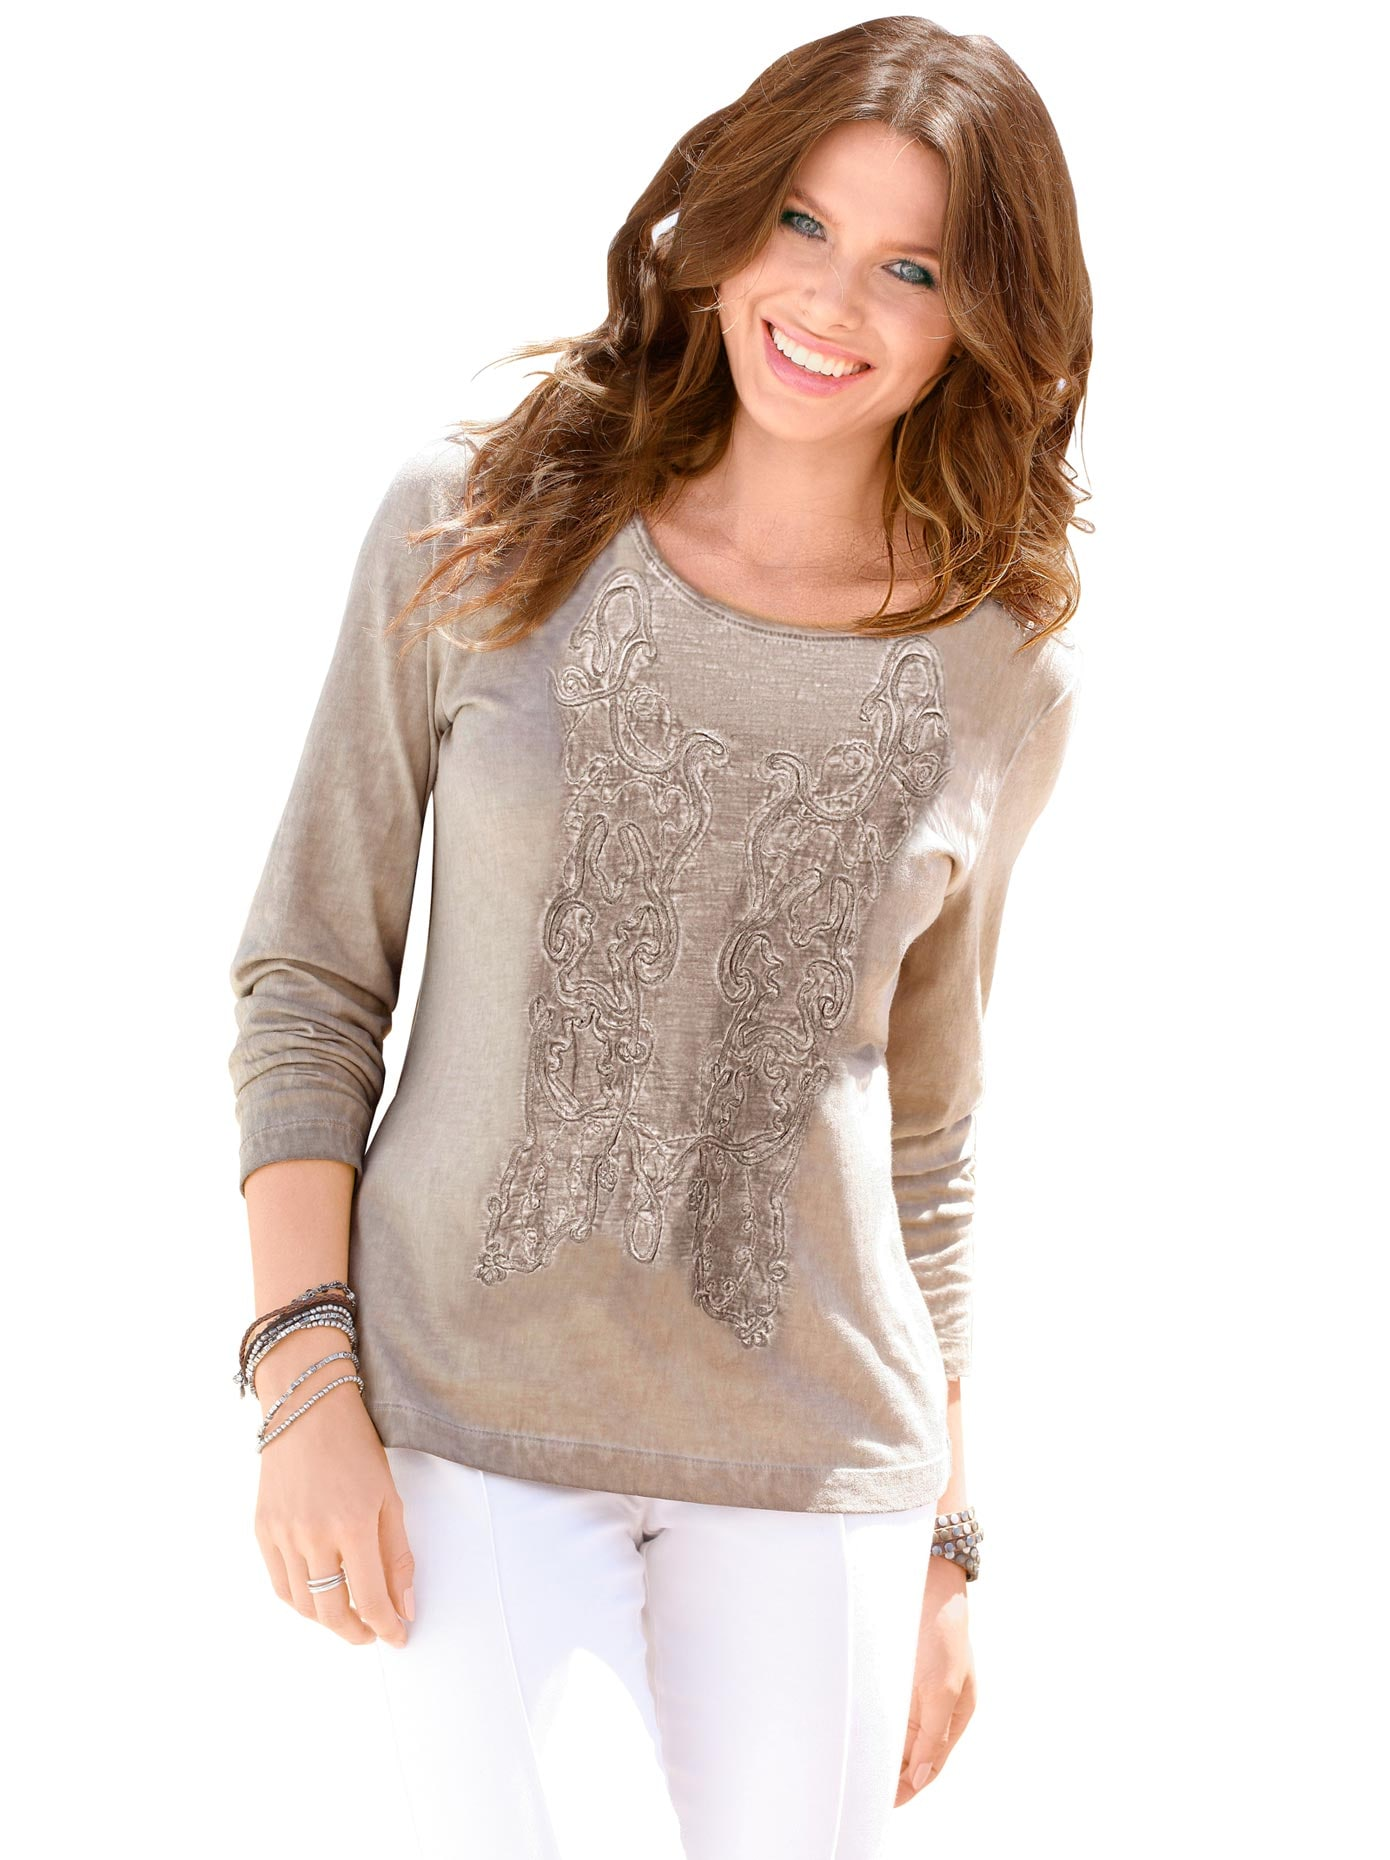 Ambria Longshirt mit langen Ärmeln   Bekleidung > Shirts > Longshirts   Ambria